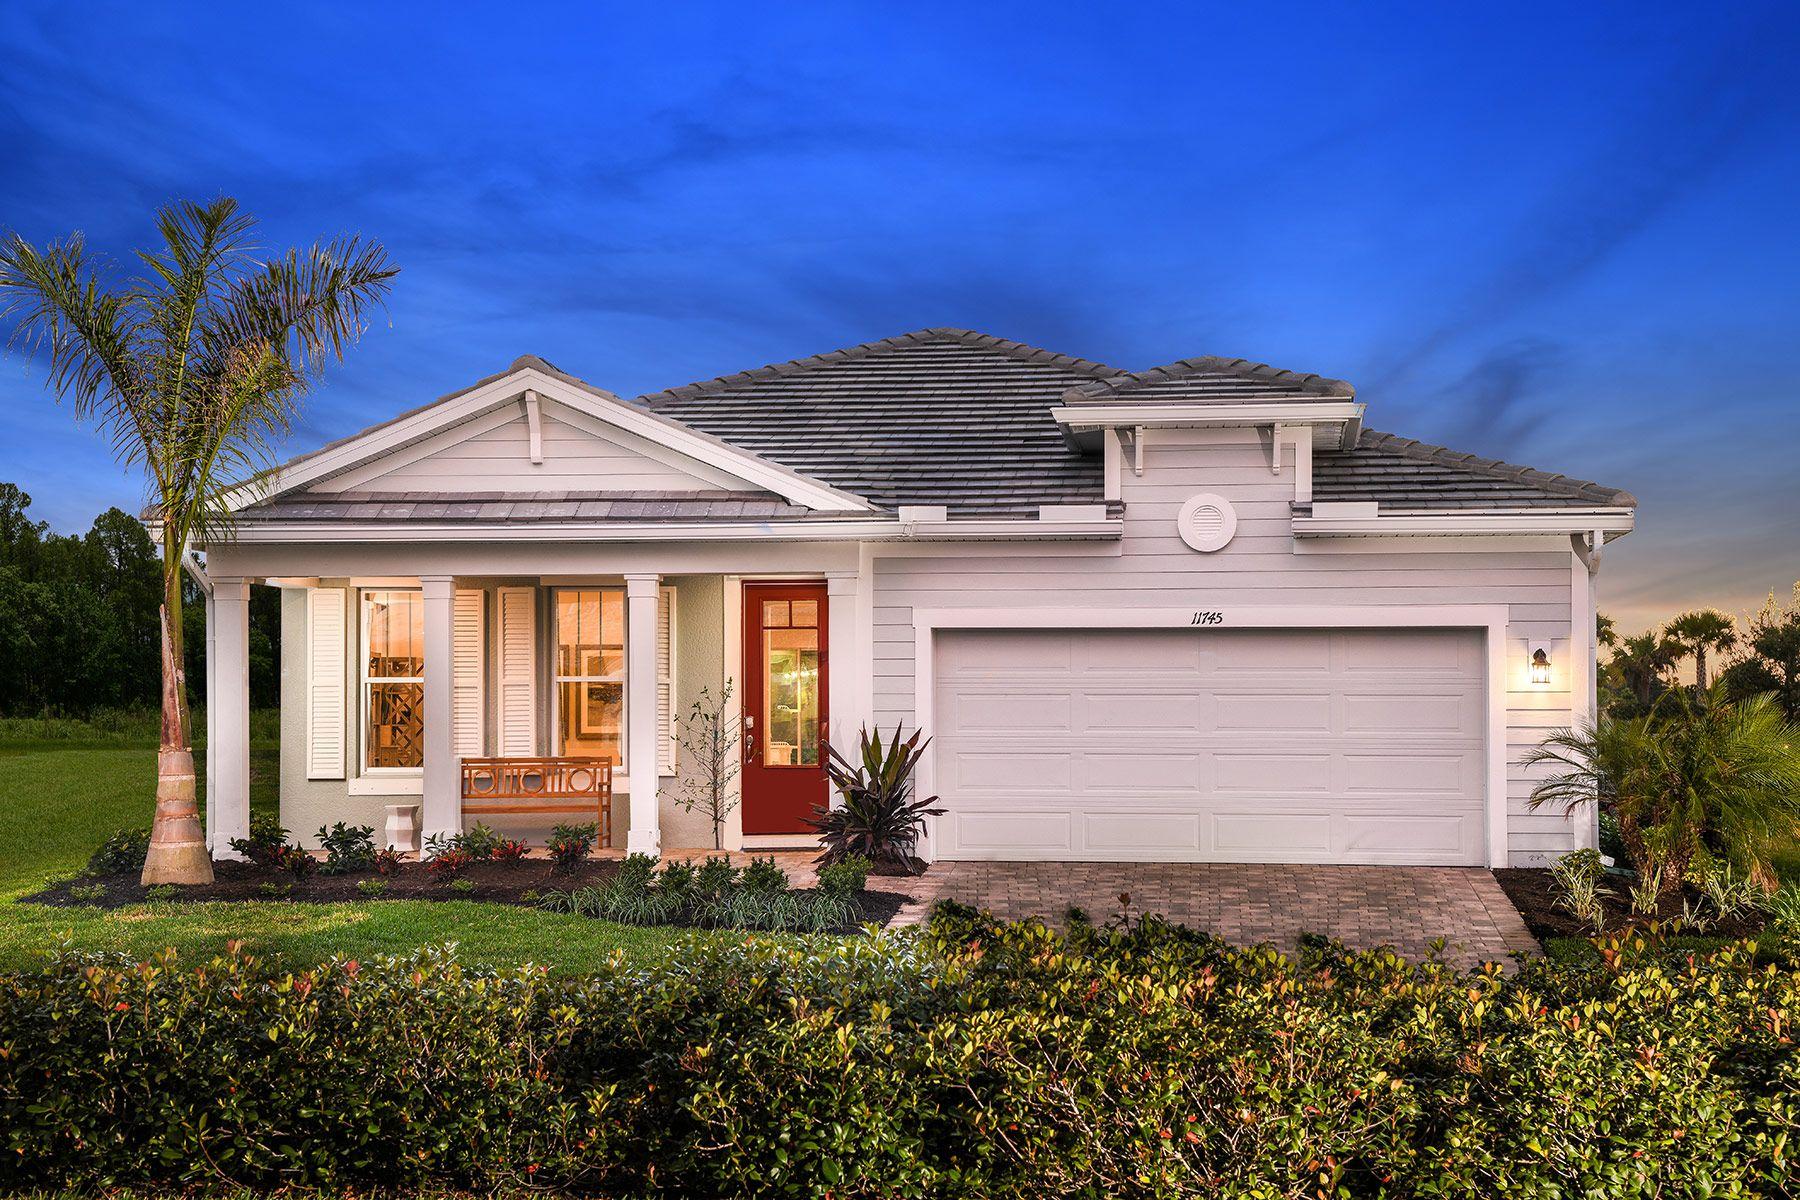 Exterior:PHOTOS ARE A REPRESENTATION OF A MODEL HOME.